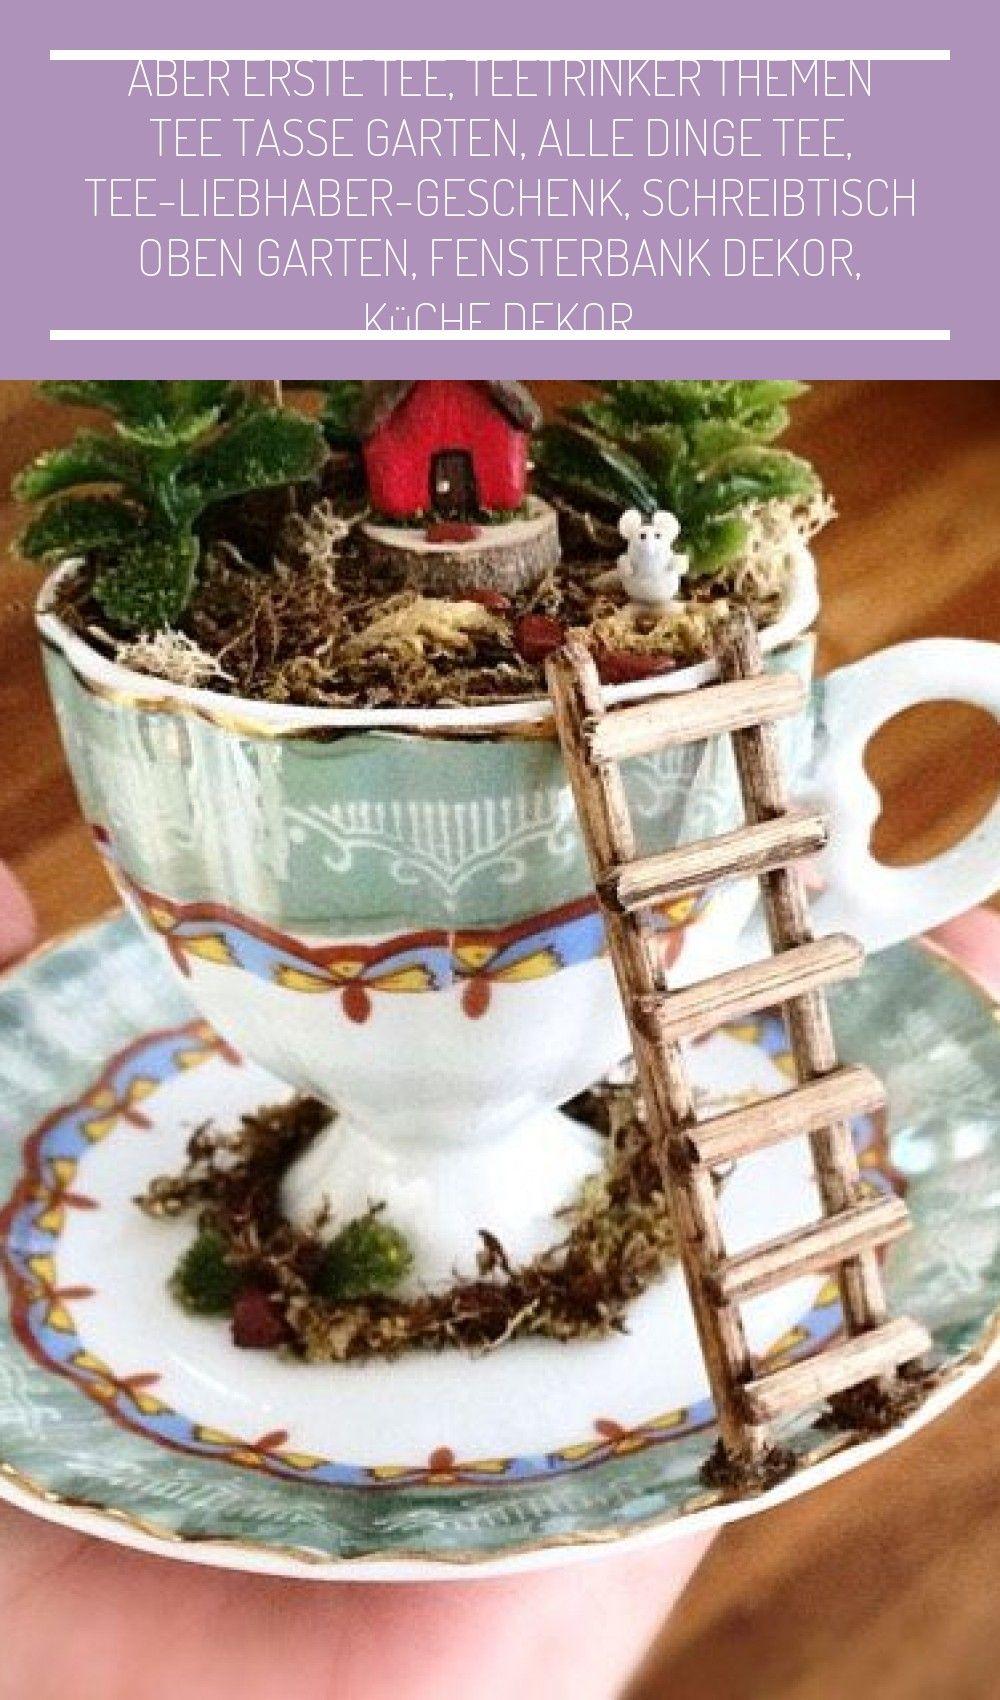 Aber Erste Tee Teetrinker The In 2020 Diy Fairy Fairy Garden Designs Fairy Garden Diy